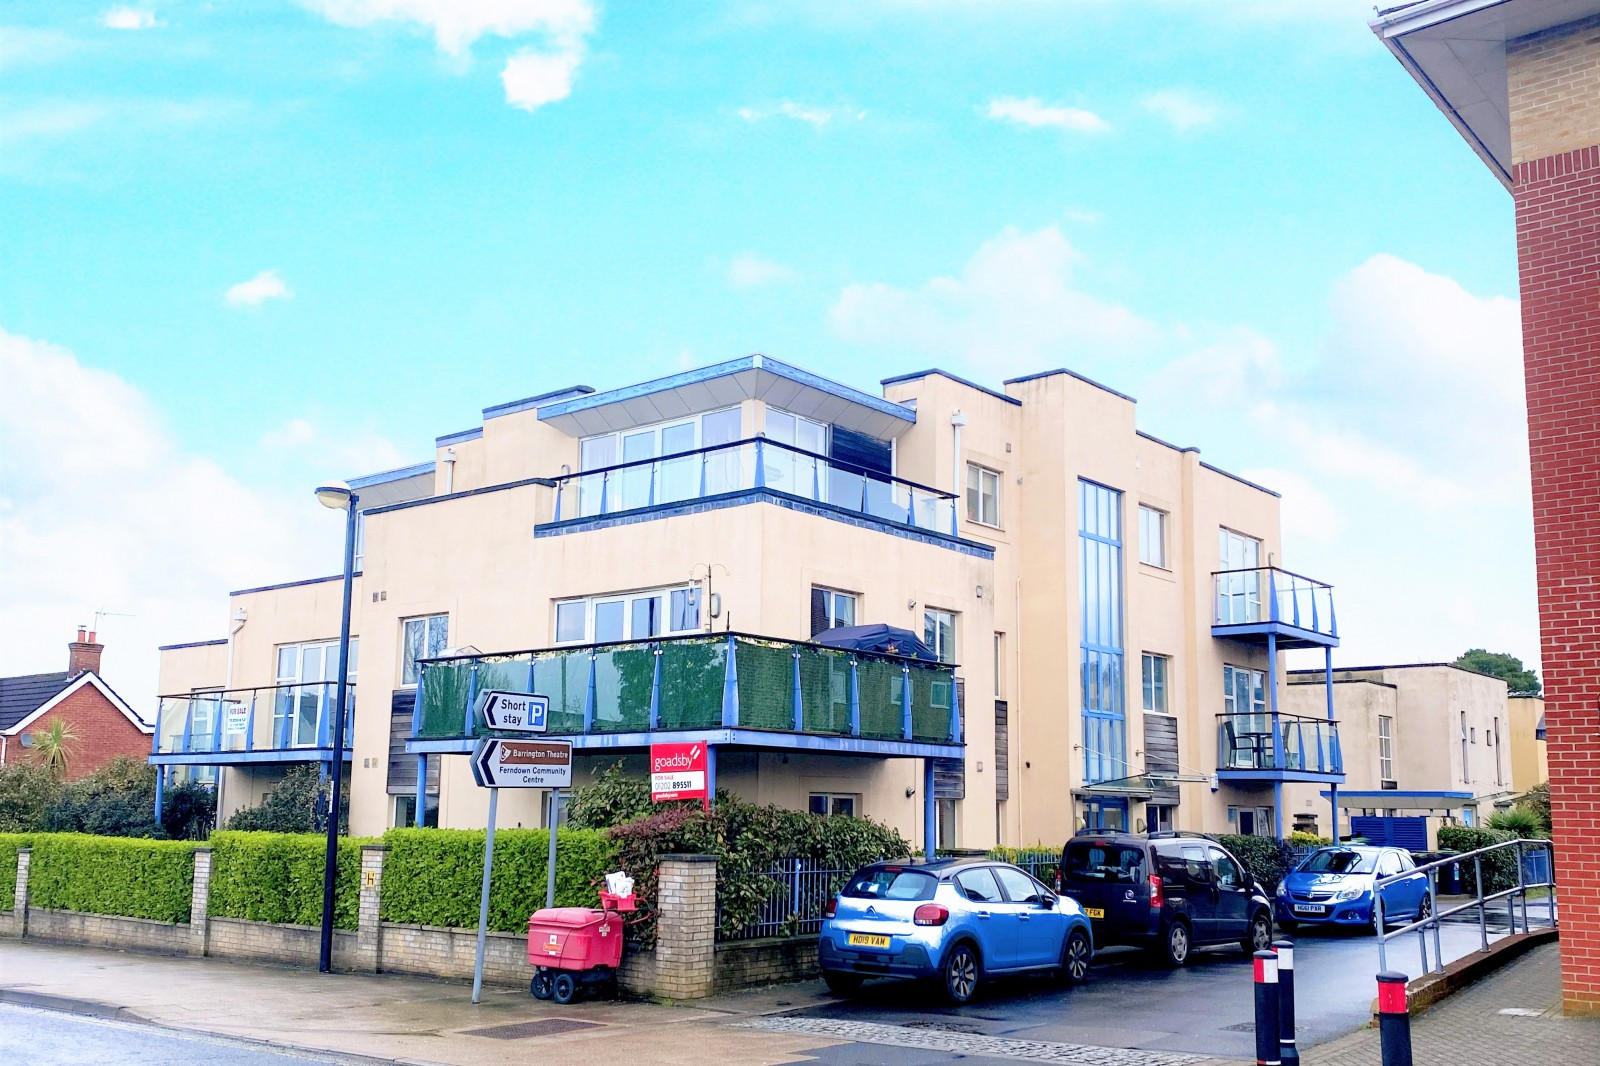 Ferndown Town Centre